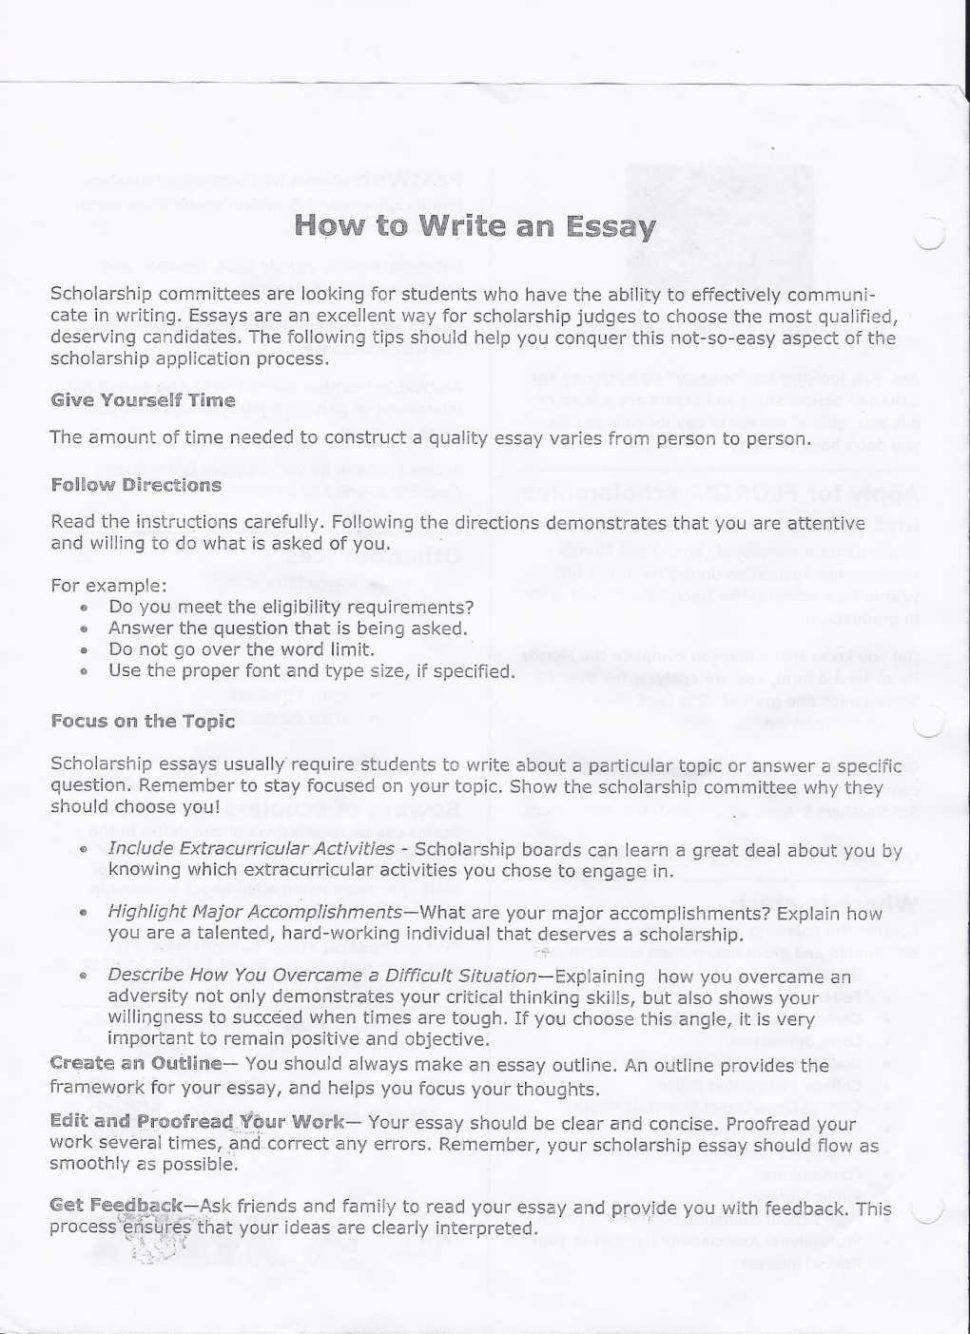 Worksheet Templates   Worksheet   Fishing For Figurative Language